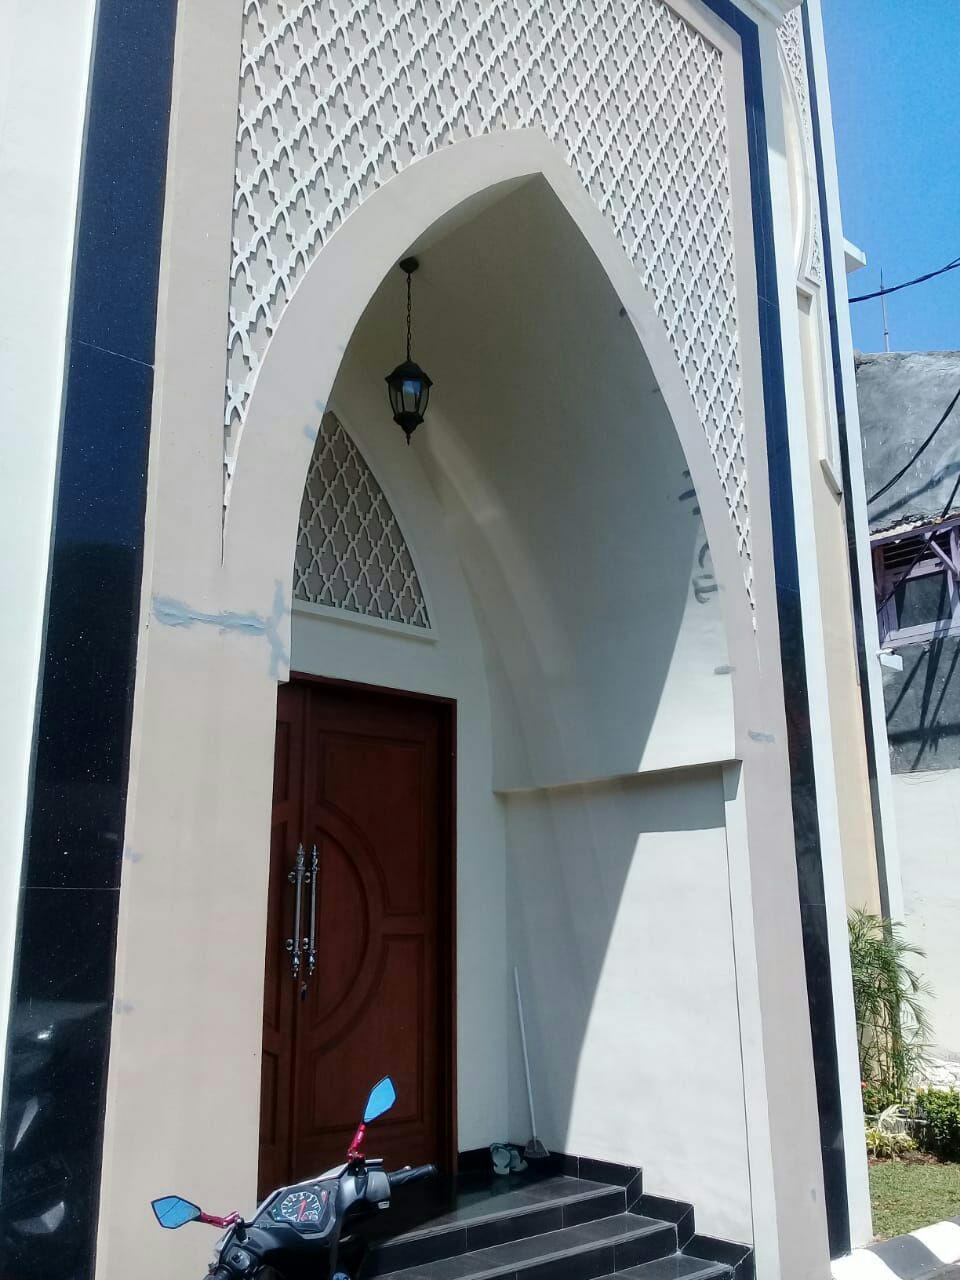 motif krawangan masjid 081288711562: krawangan masjid modern ...